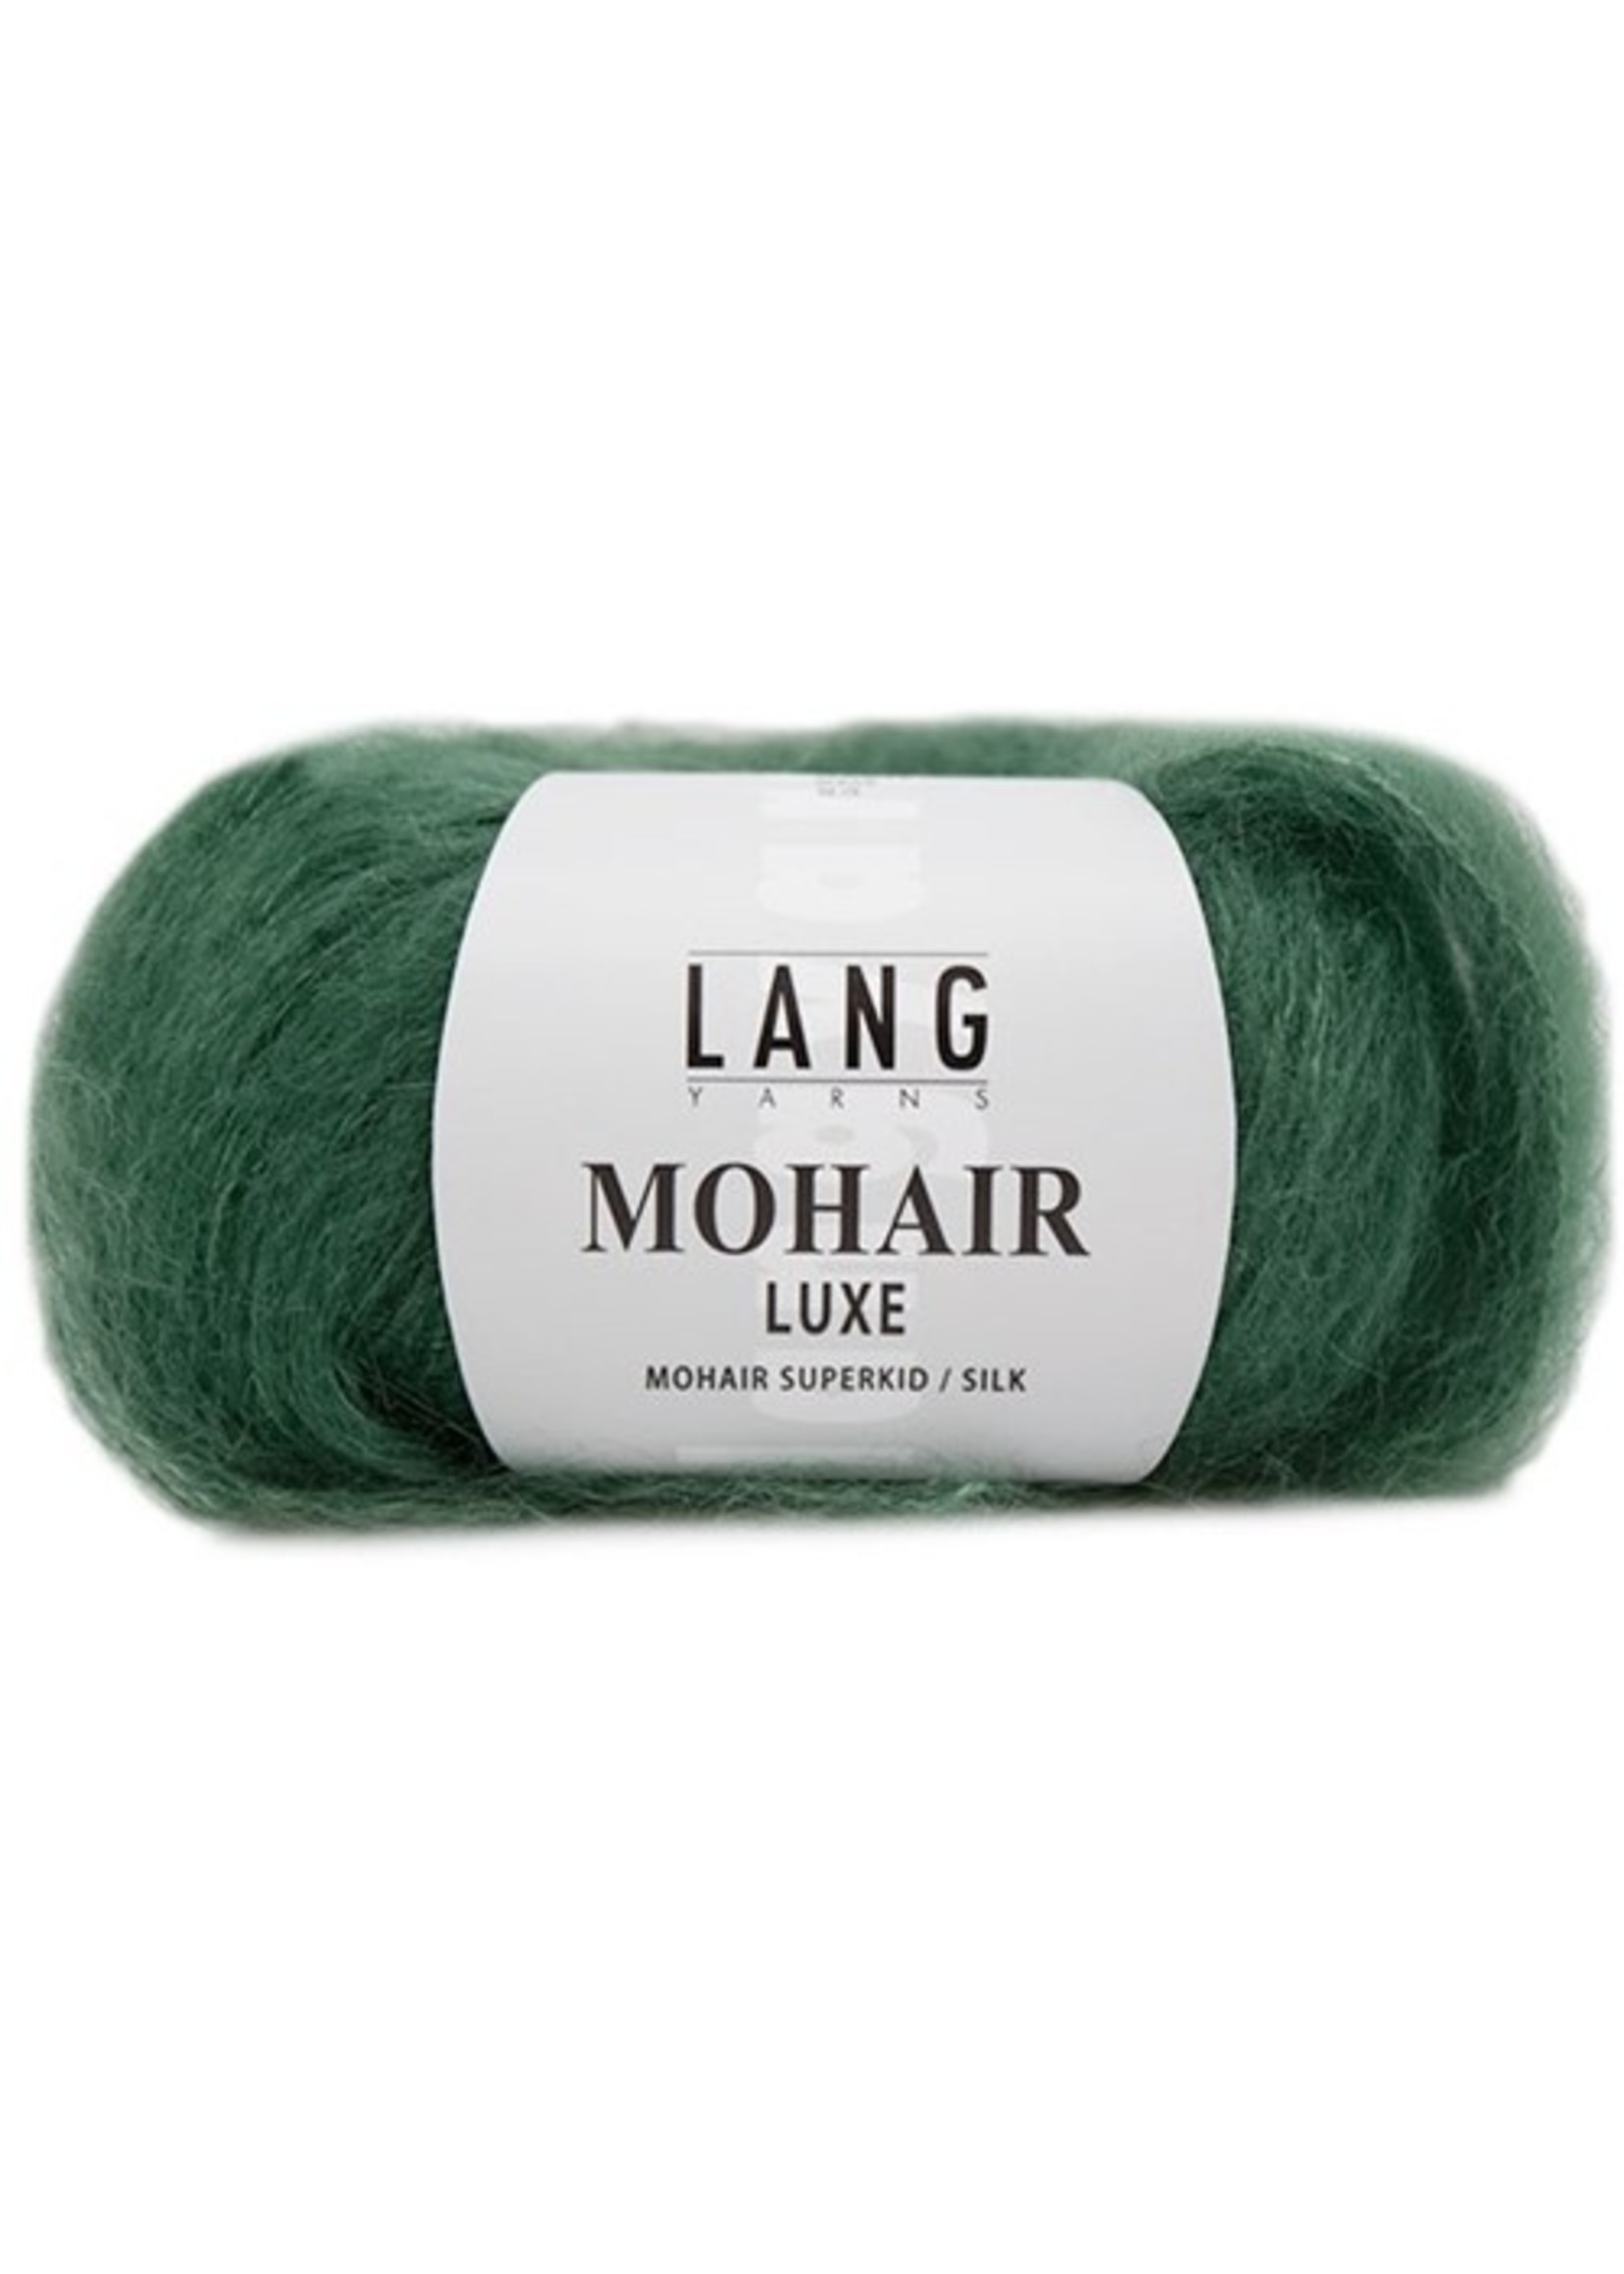 LangYarns Mohair Luxe - 0093 Groen